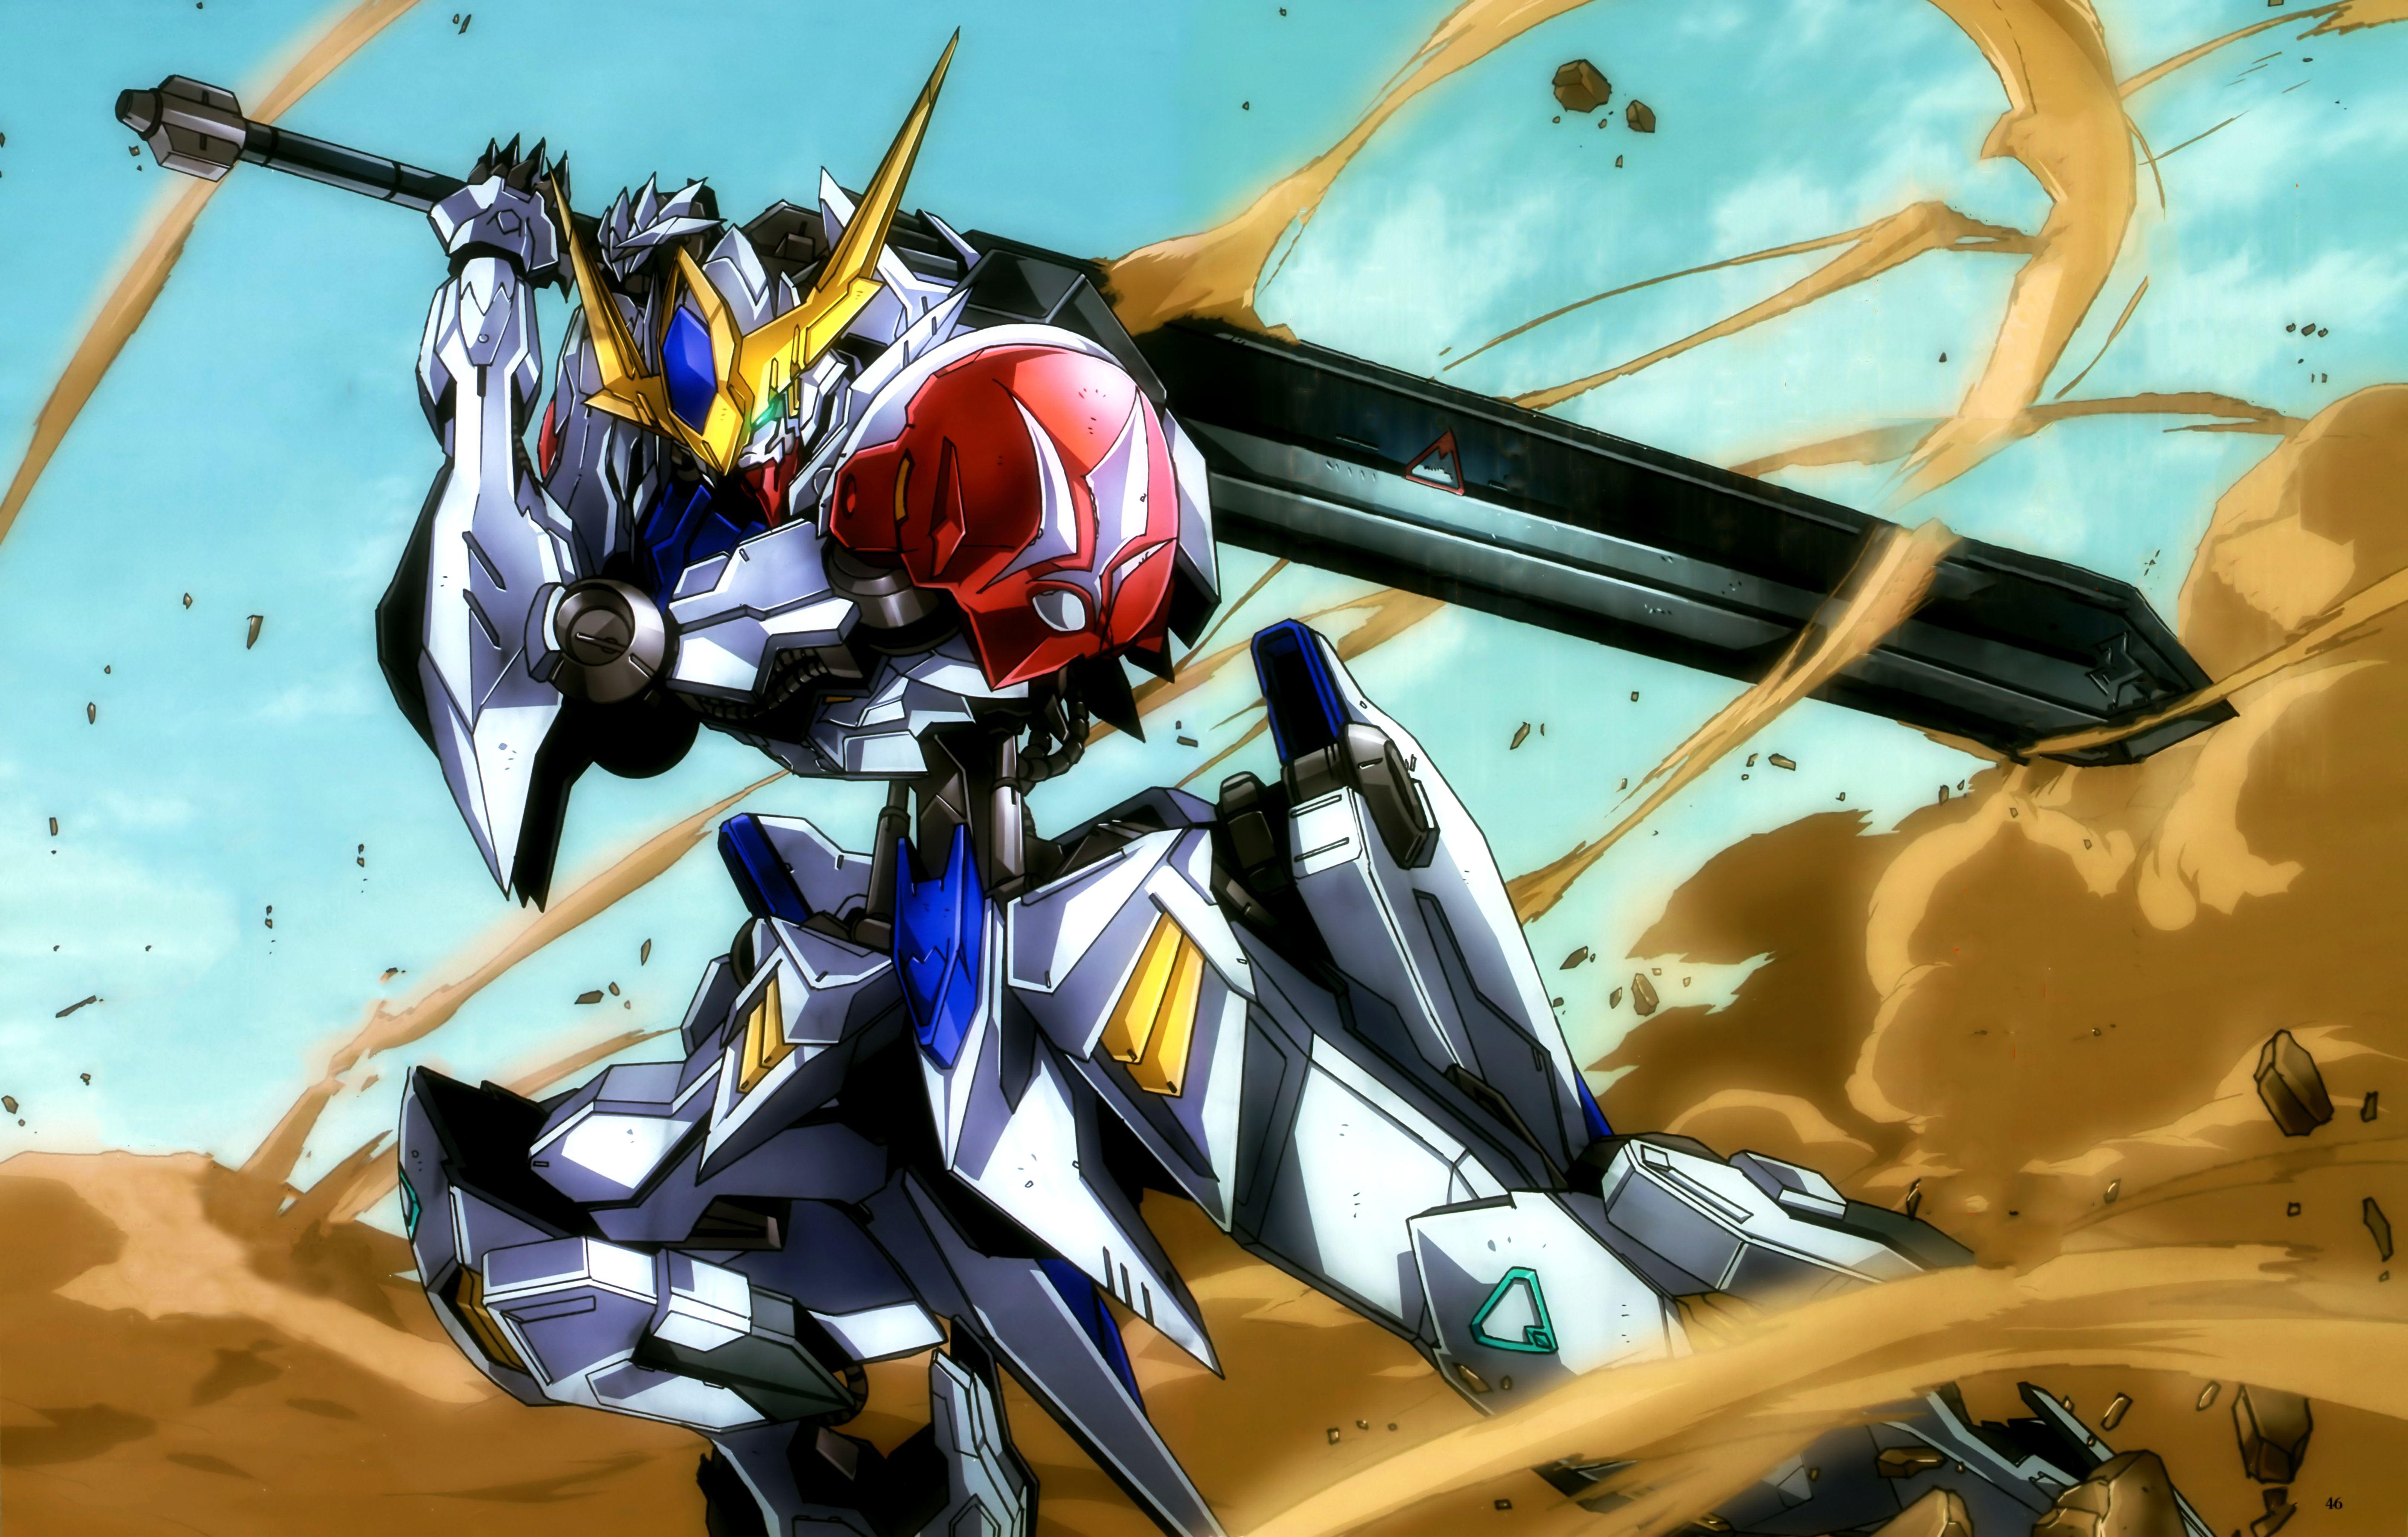 Mobile_Suit_GundamTekketsu_no_Orphans by Rwero Gundam